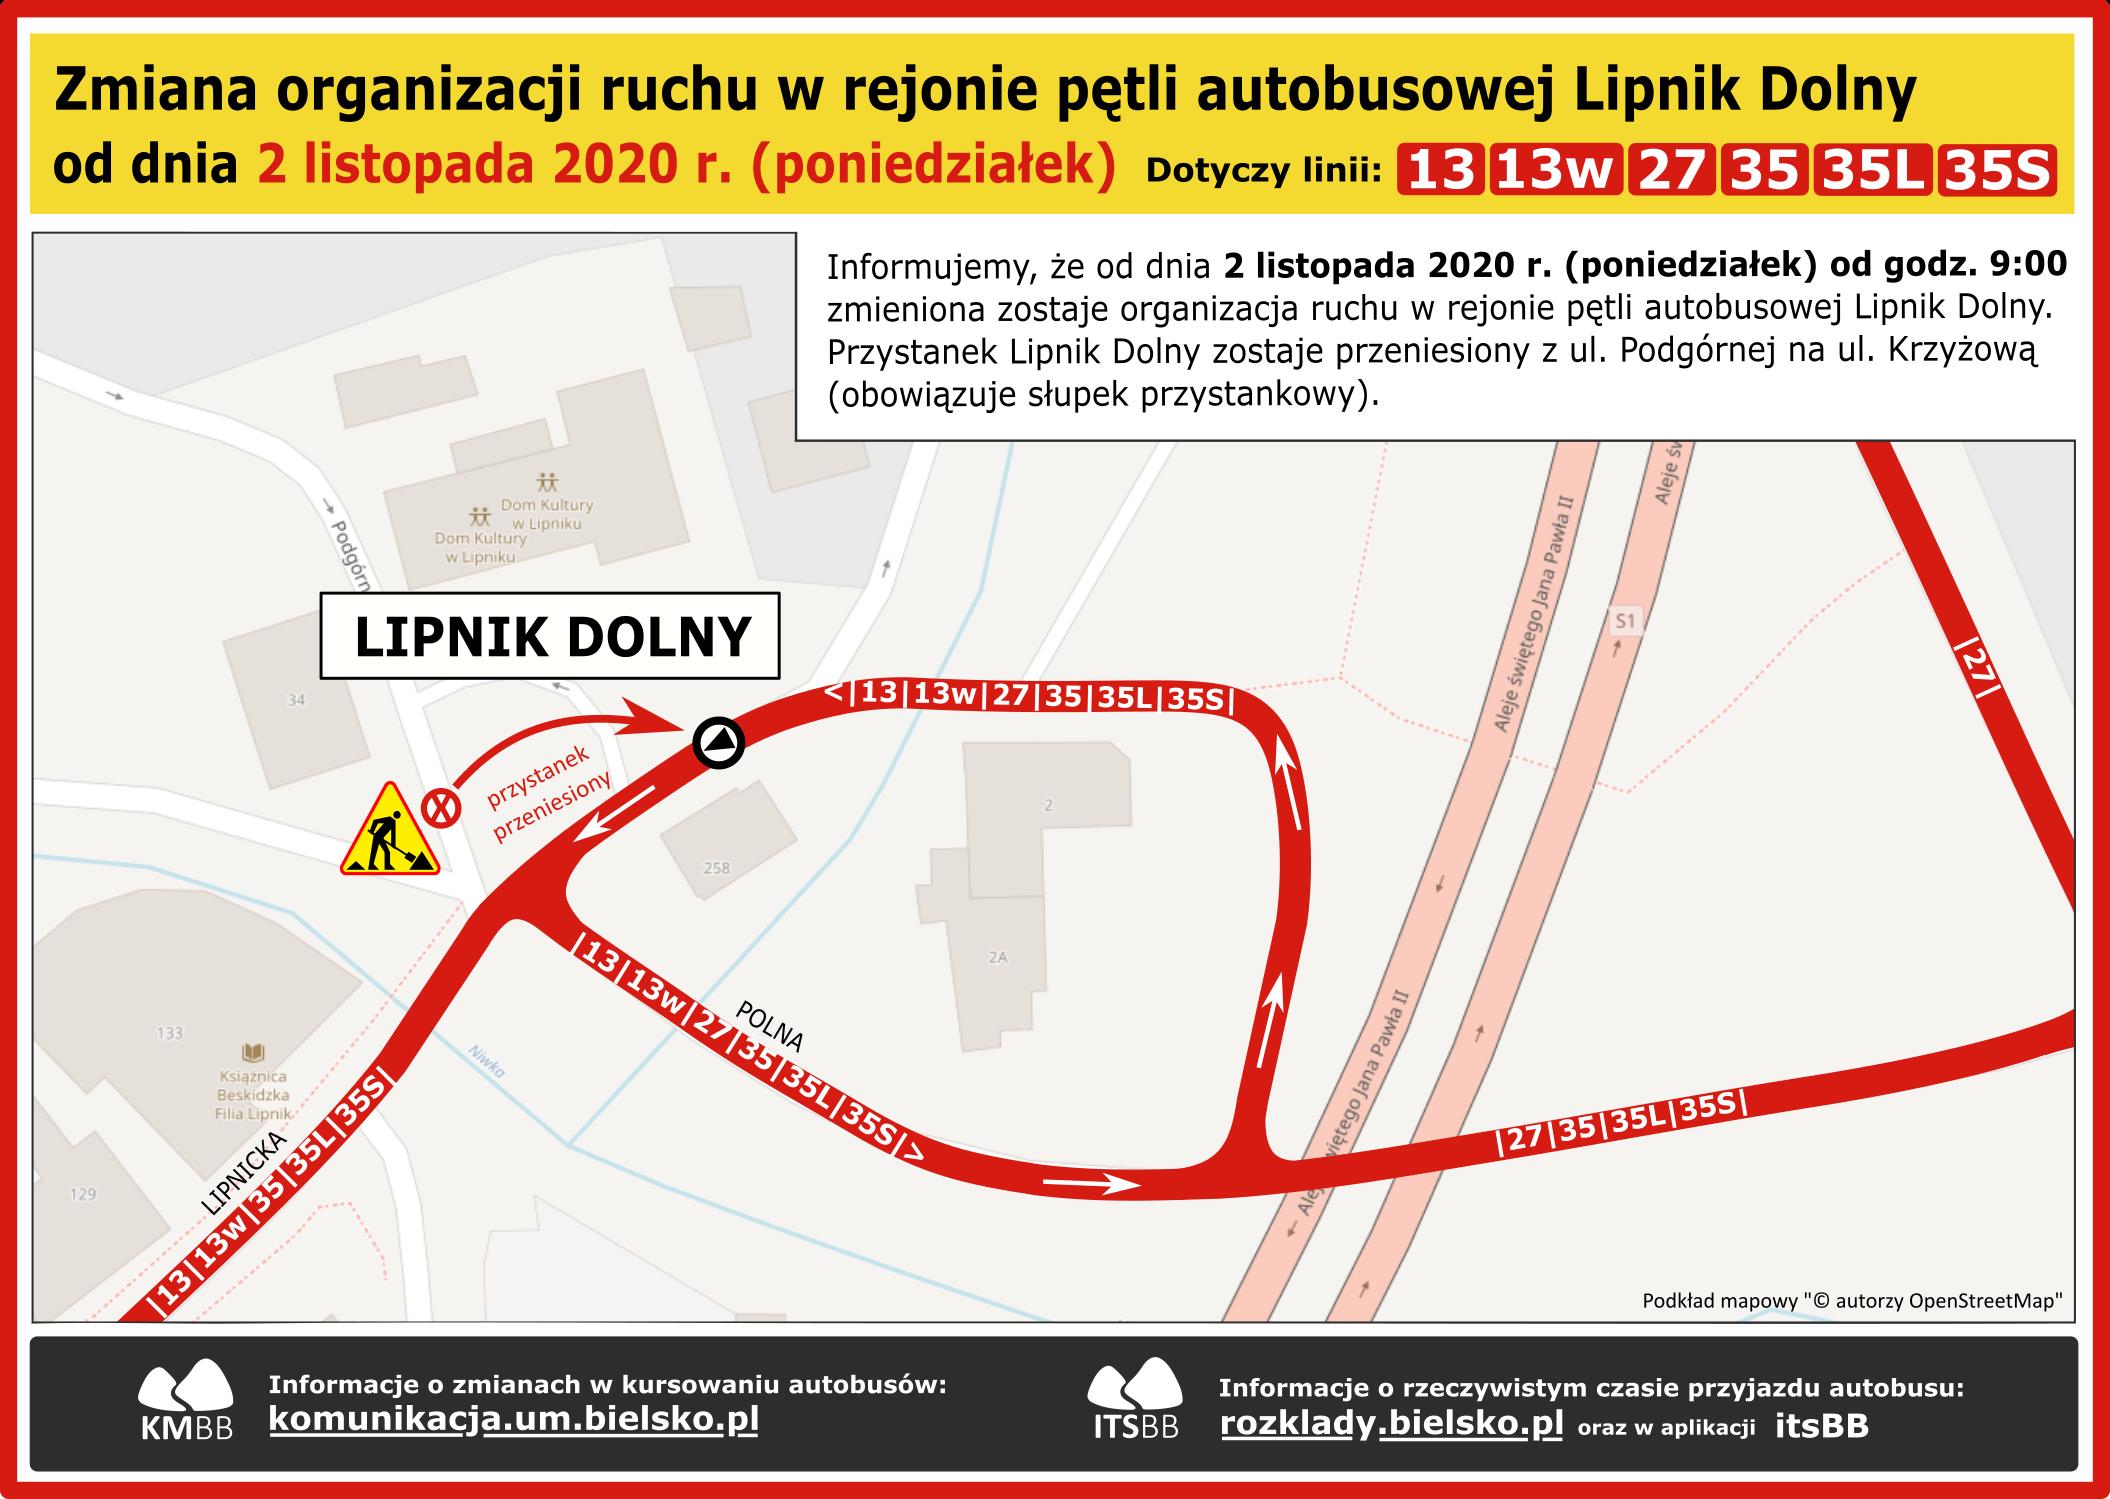 Zmiana organizacji ruchu Lipnik Dolny